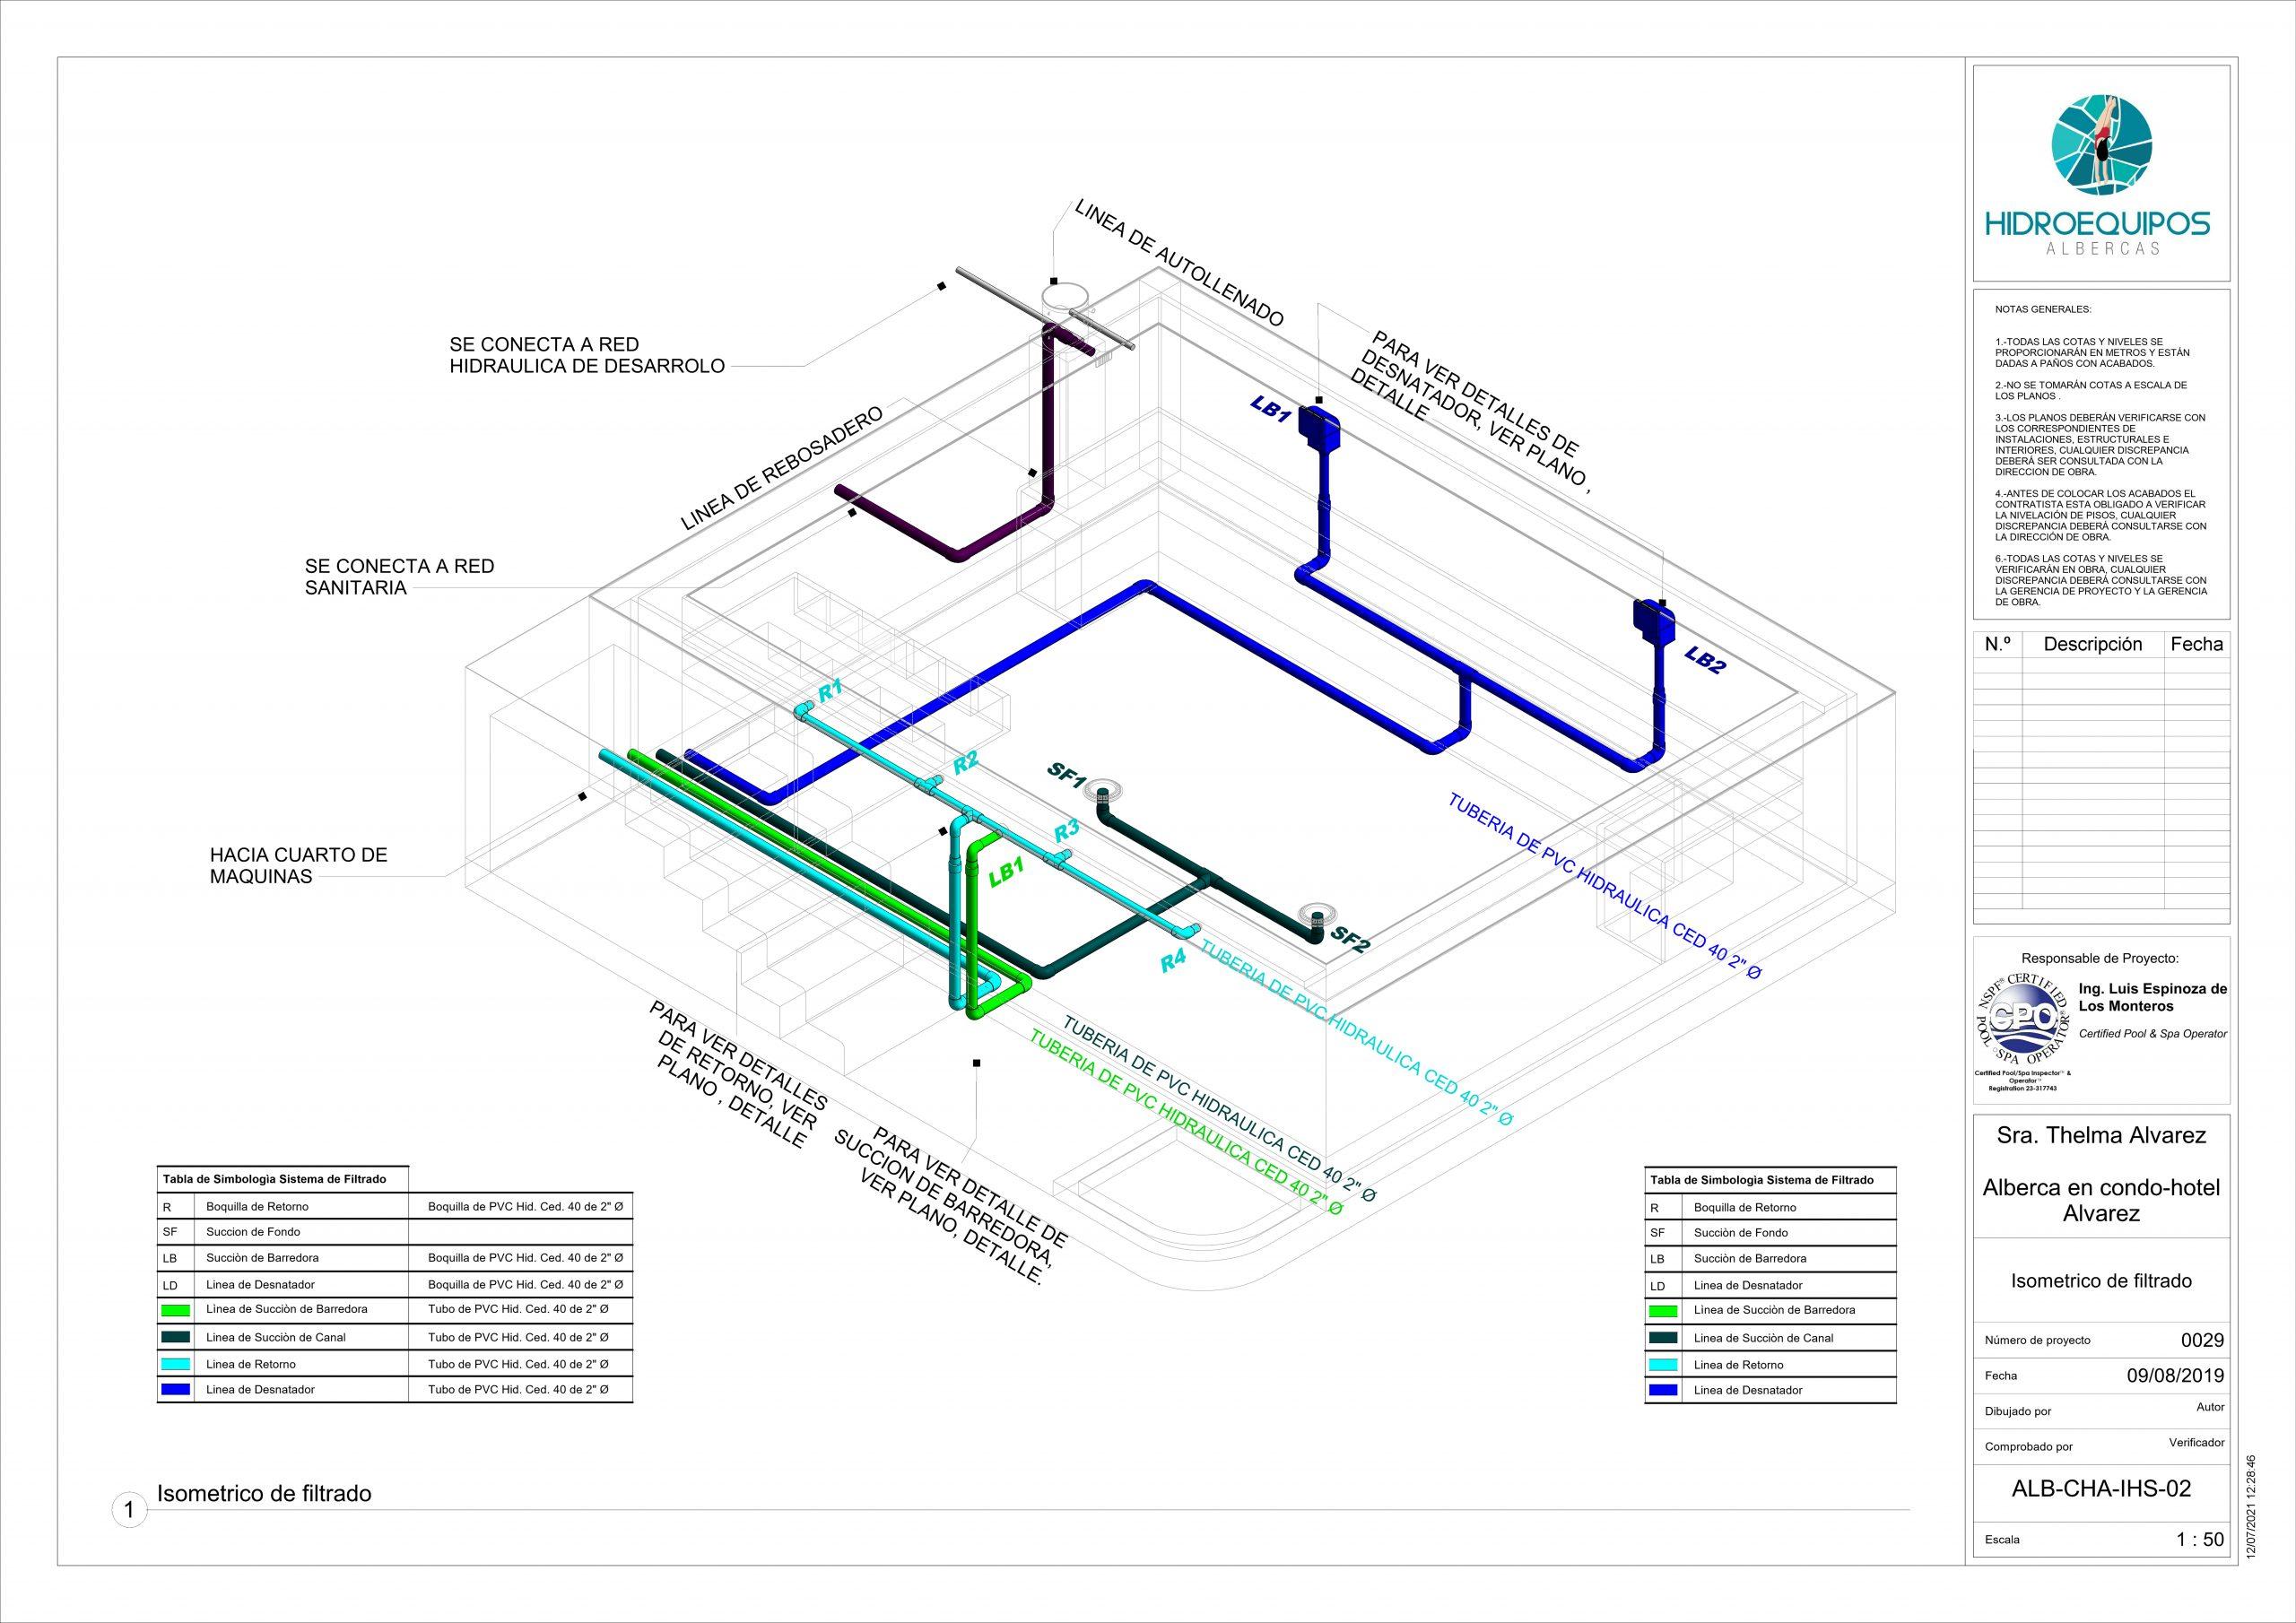 29 – Plano – ALB-CHA-IHS-02 – Isometrico de filtrado